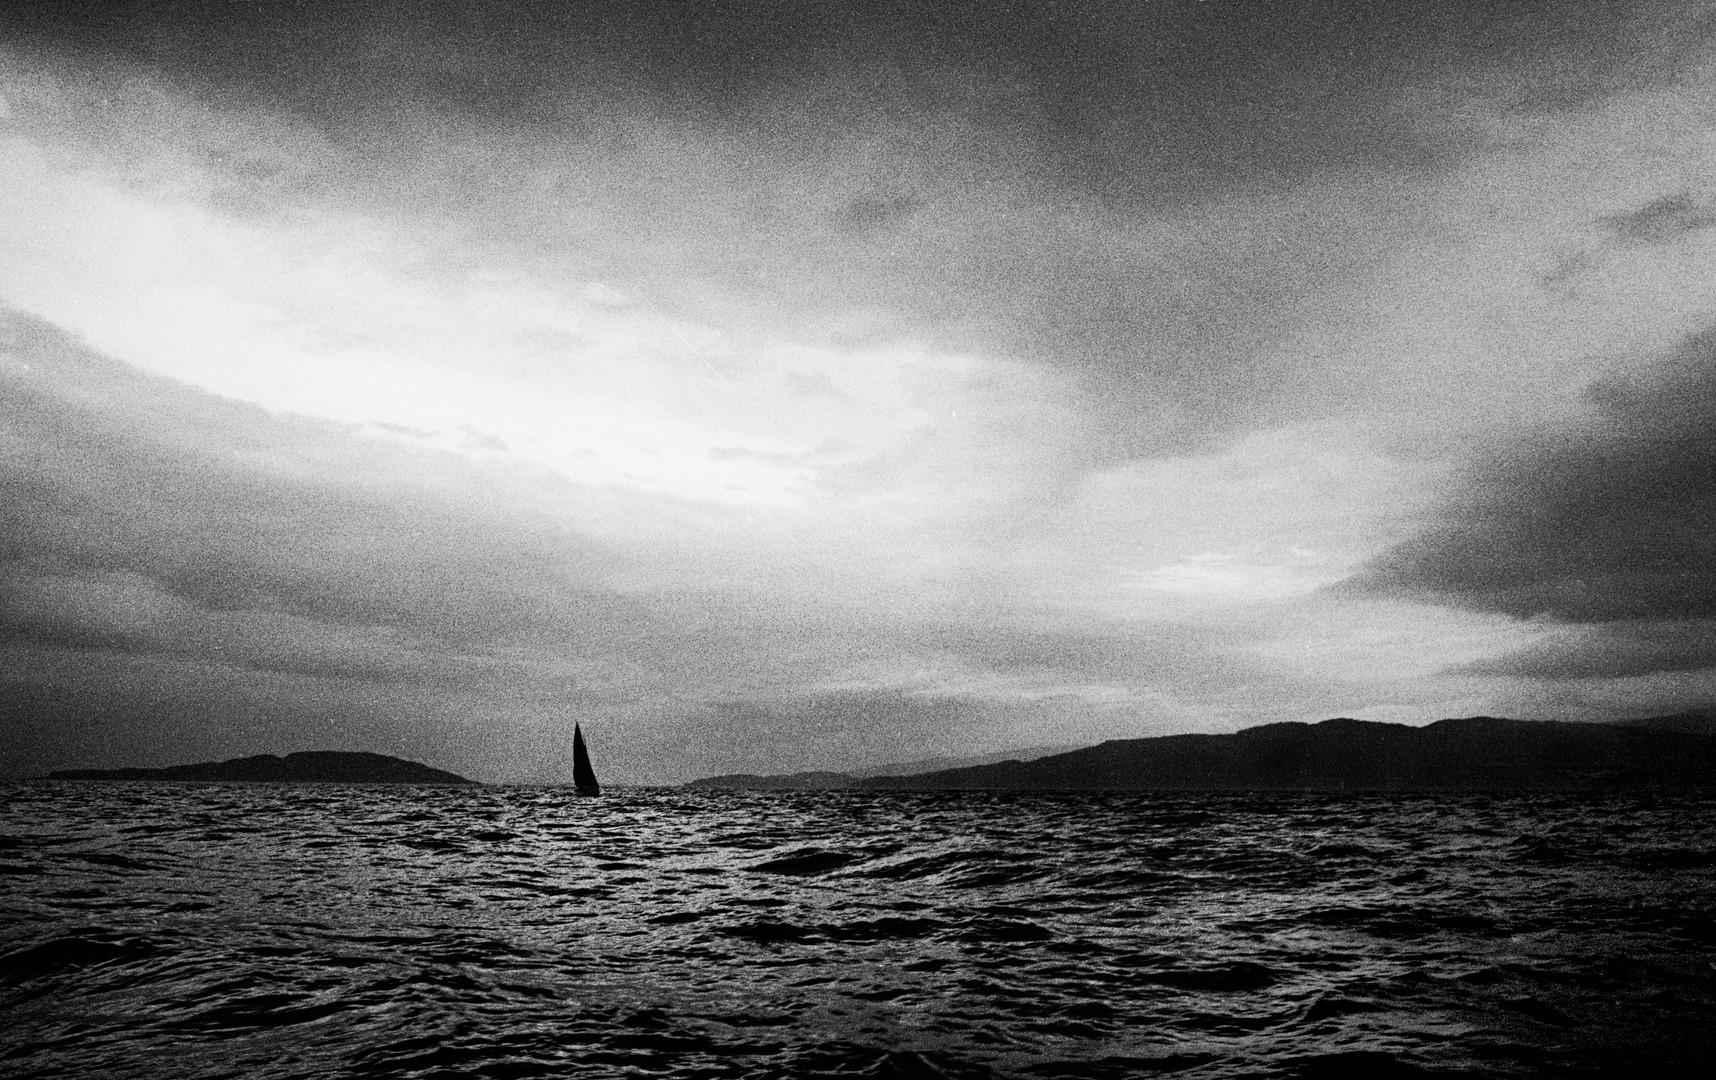 Big Sea, Little Sail